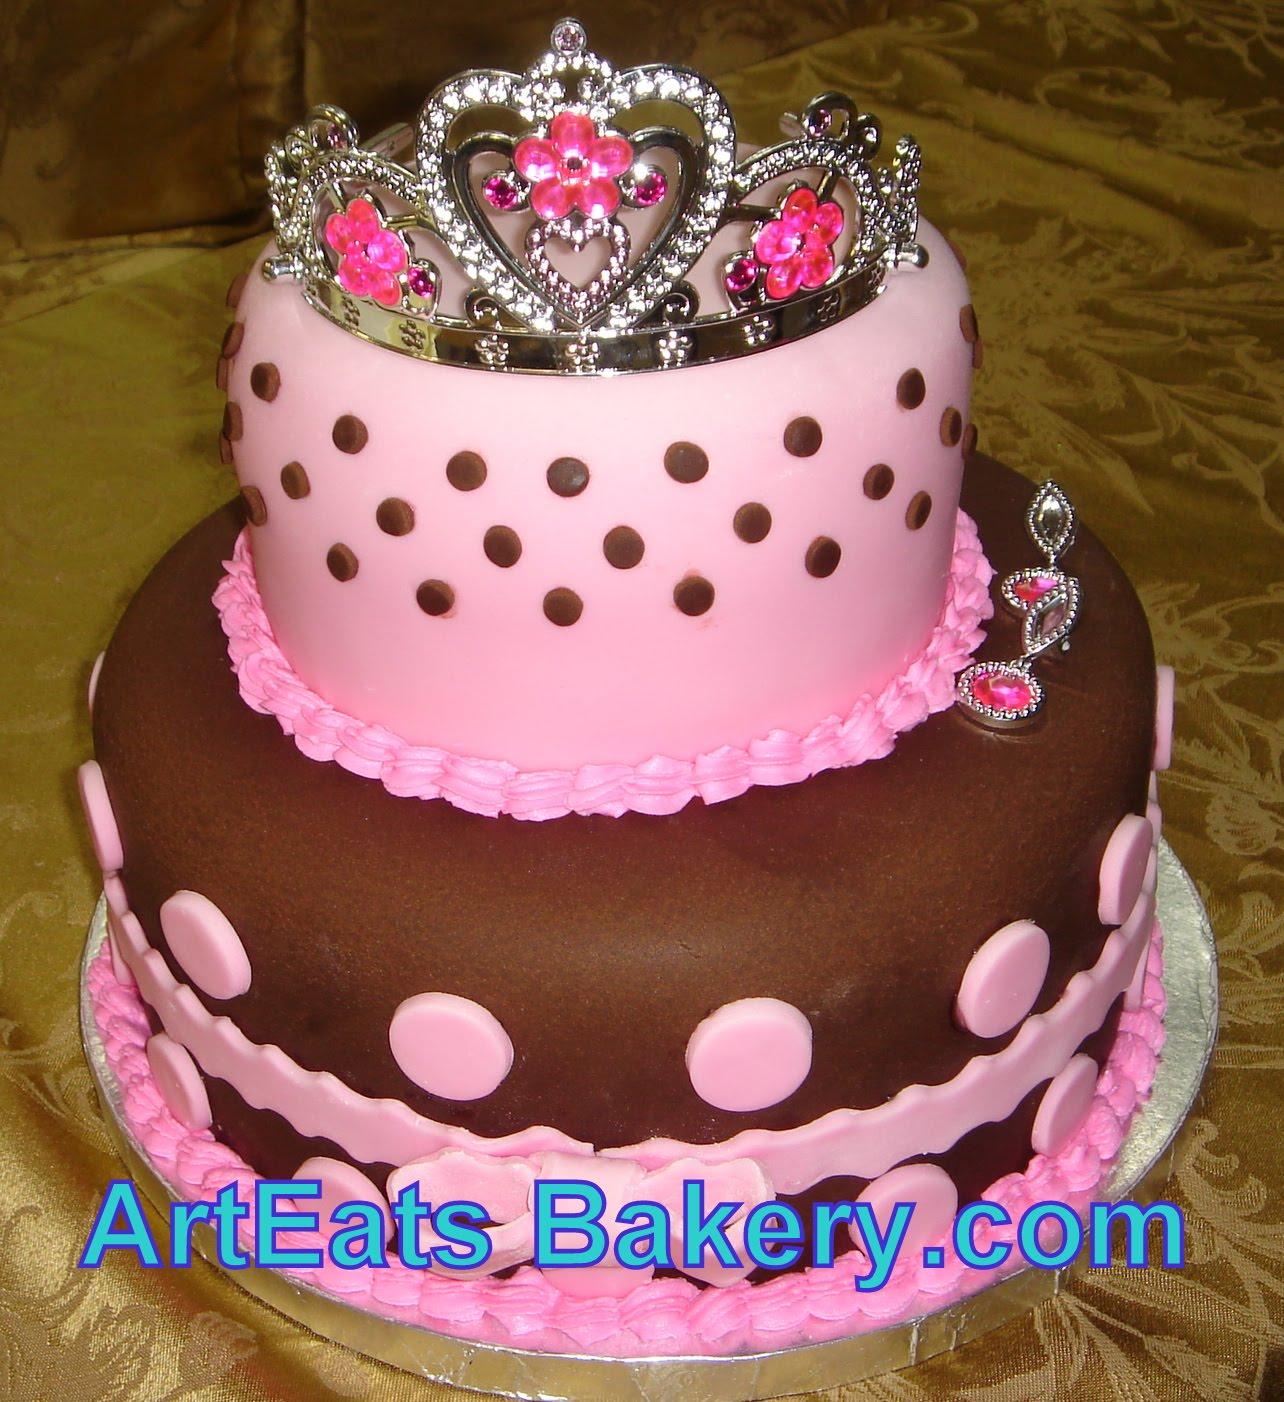 Princess Cake Designs Little Girl : Art Eats Bakery custom fondant wedding and birthday cake ...